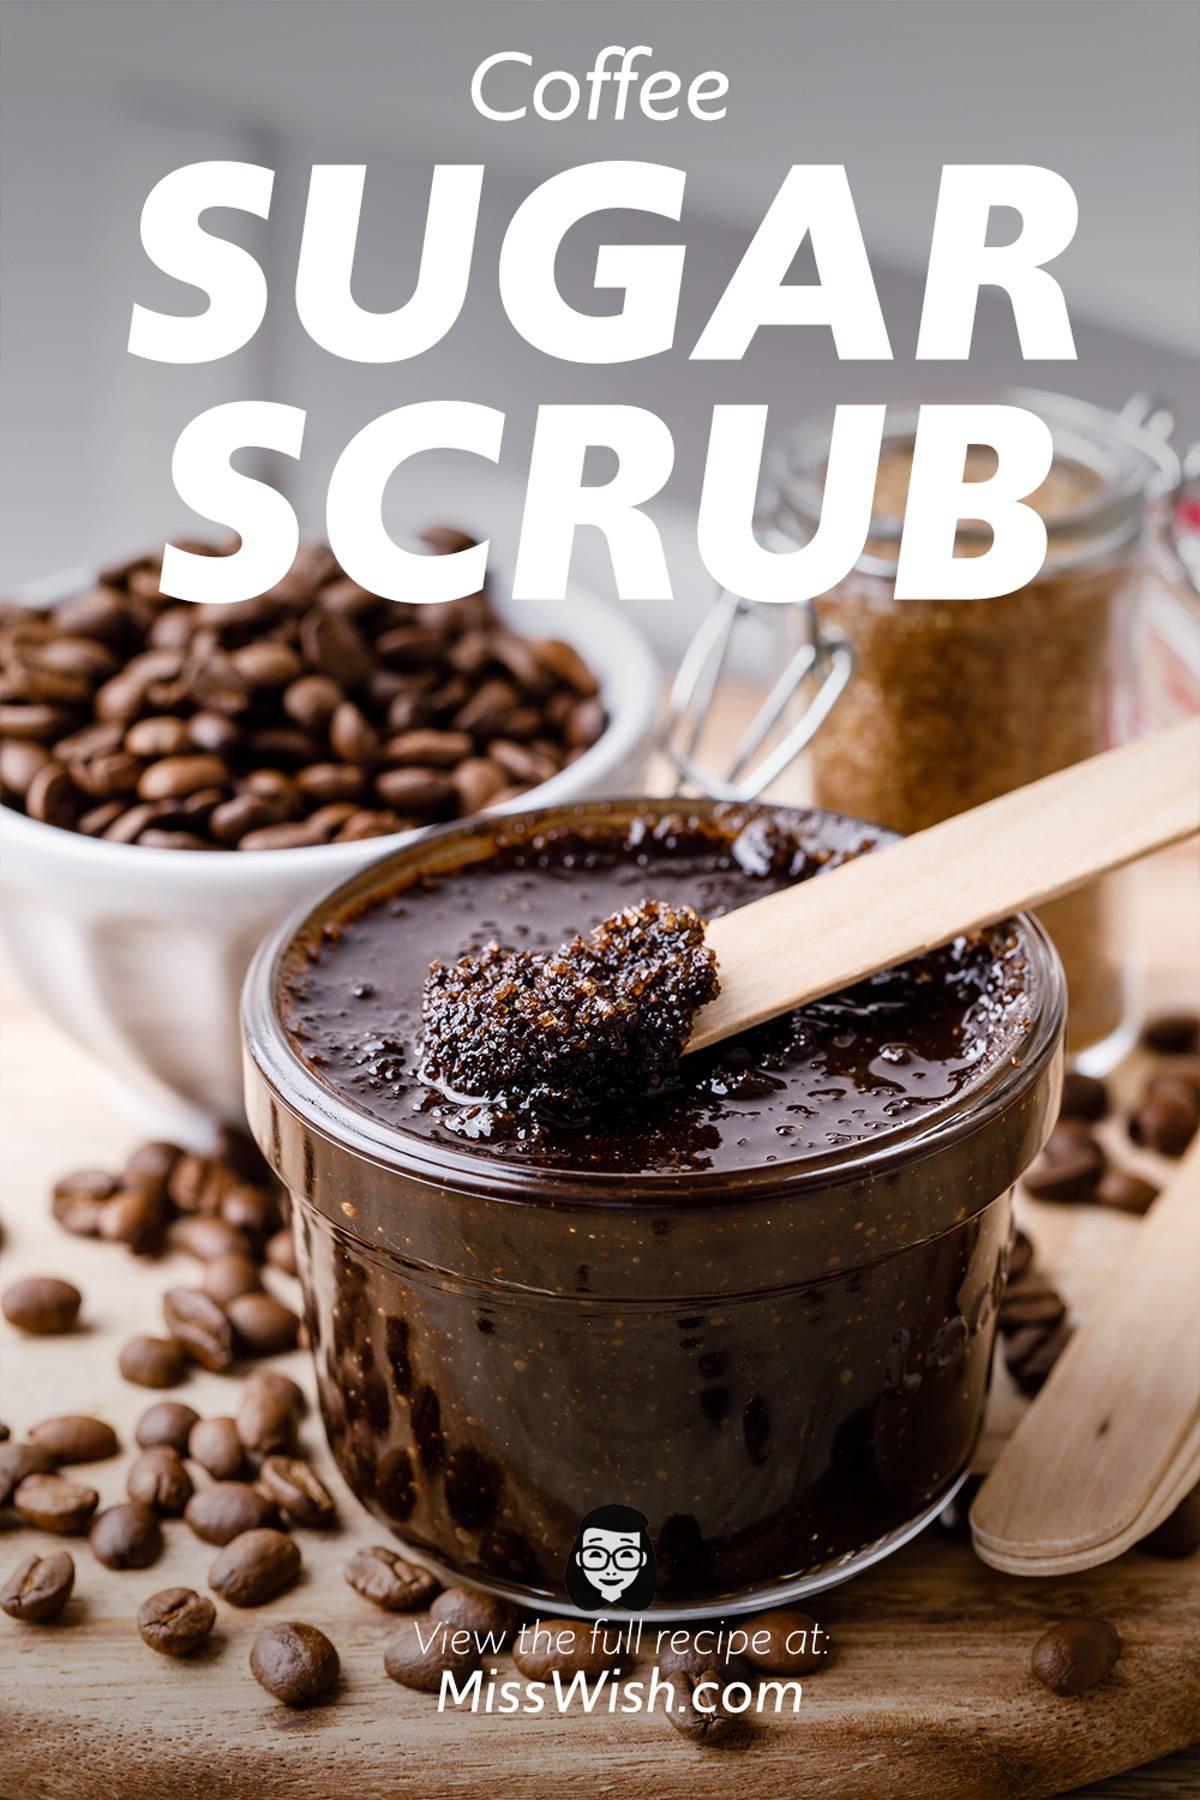 4-Ingredient Coffee and Sugar Face Scrub